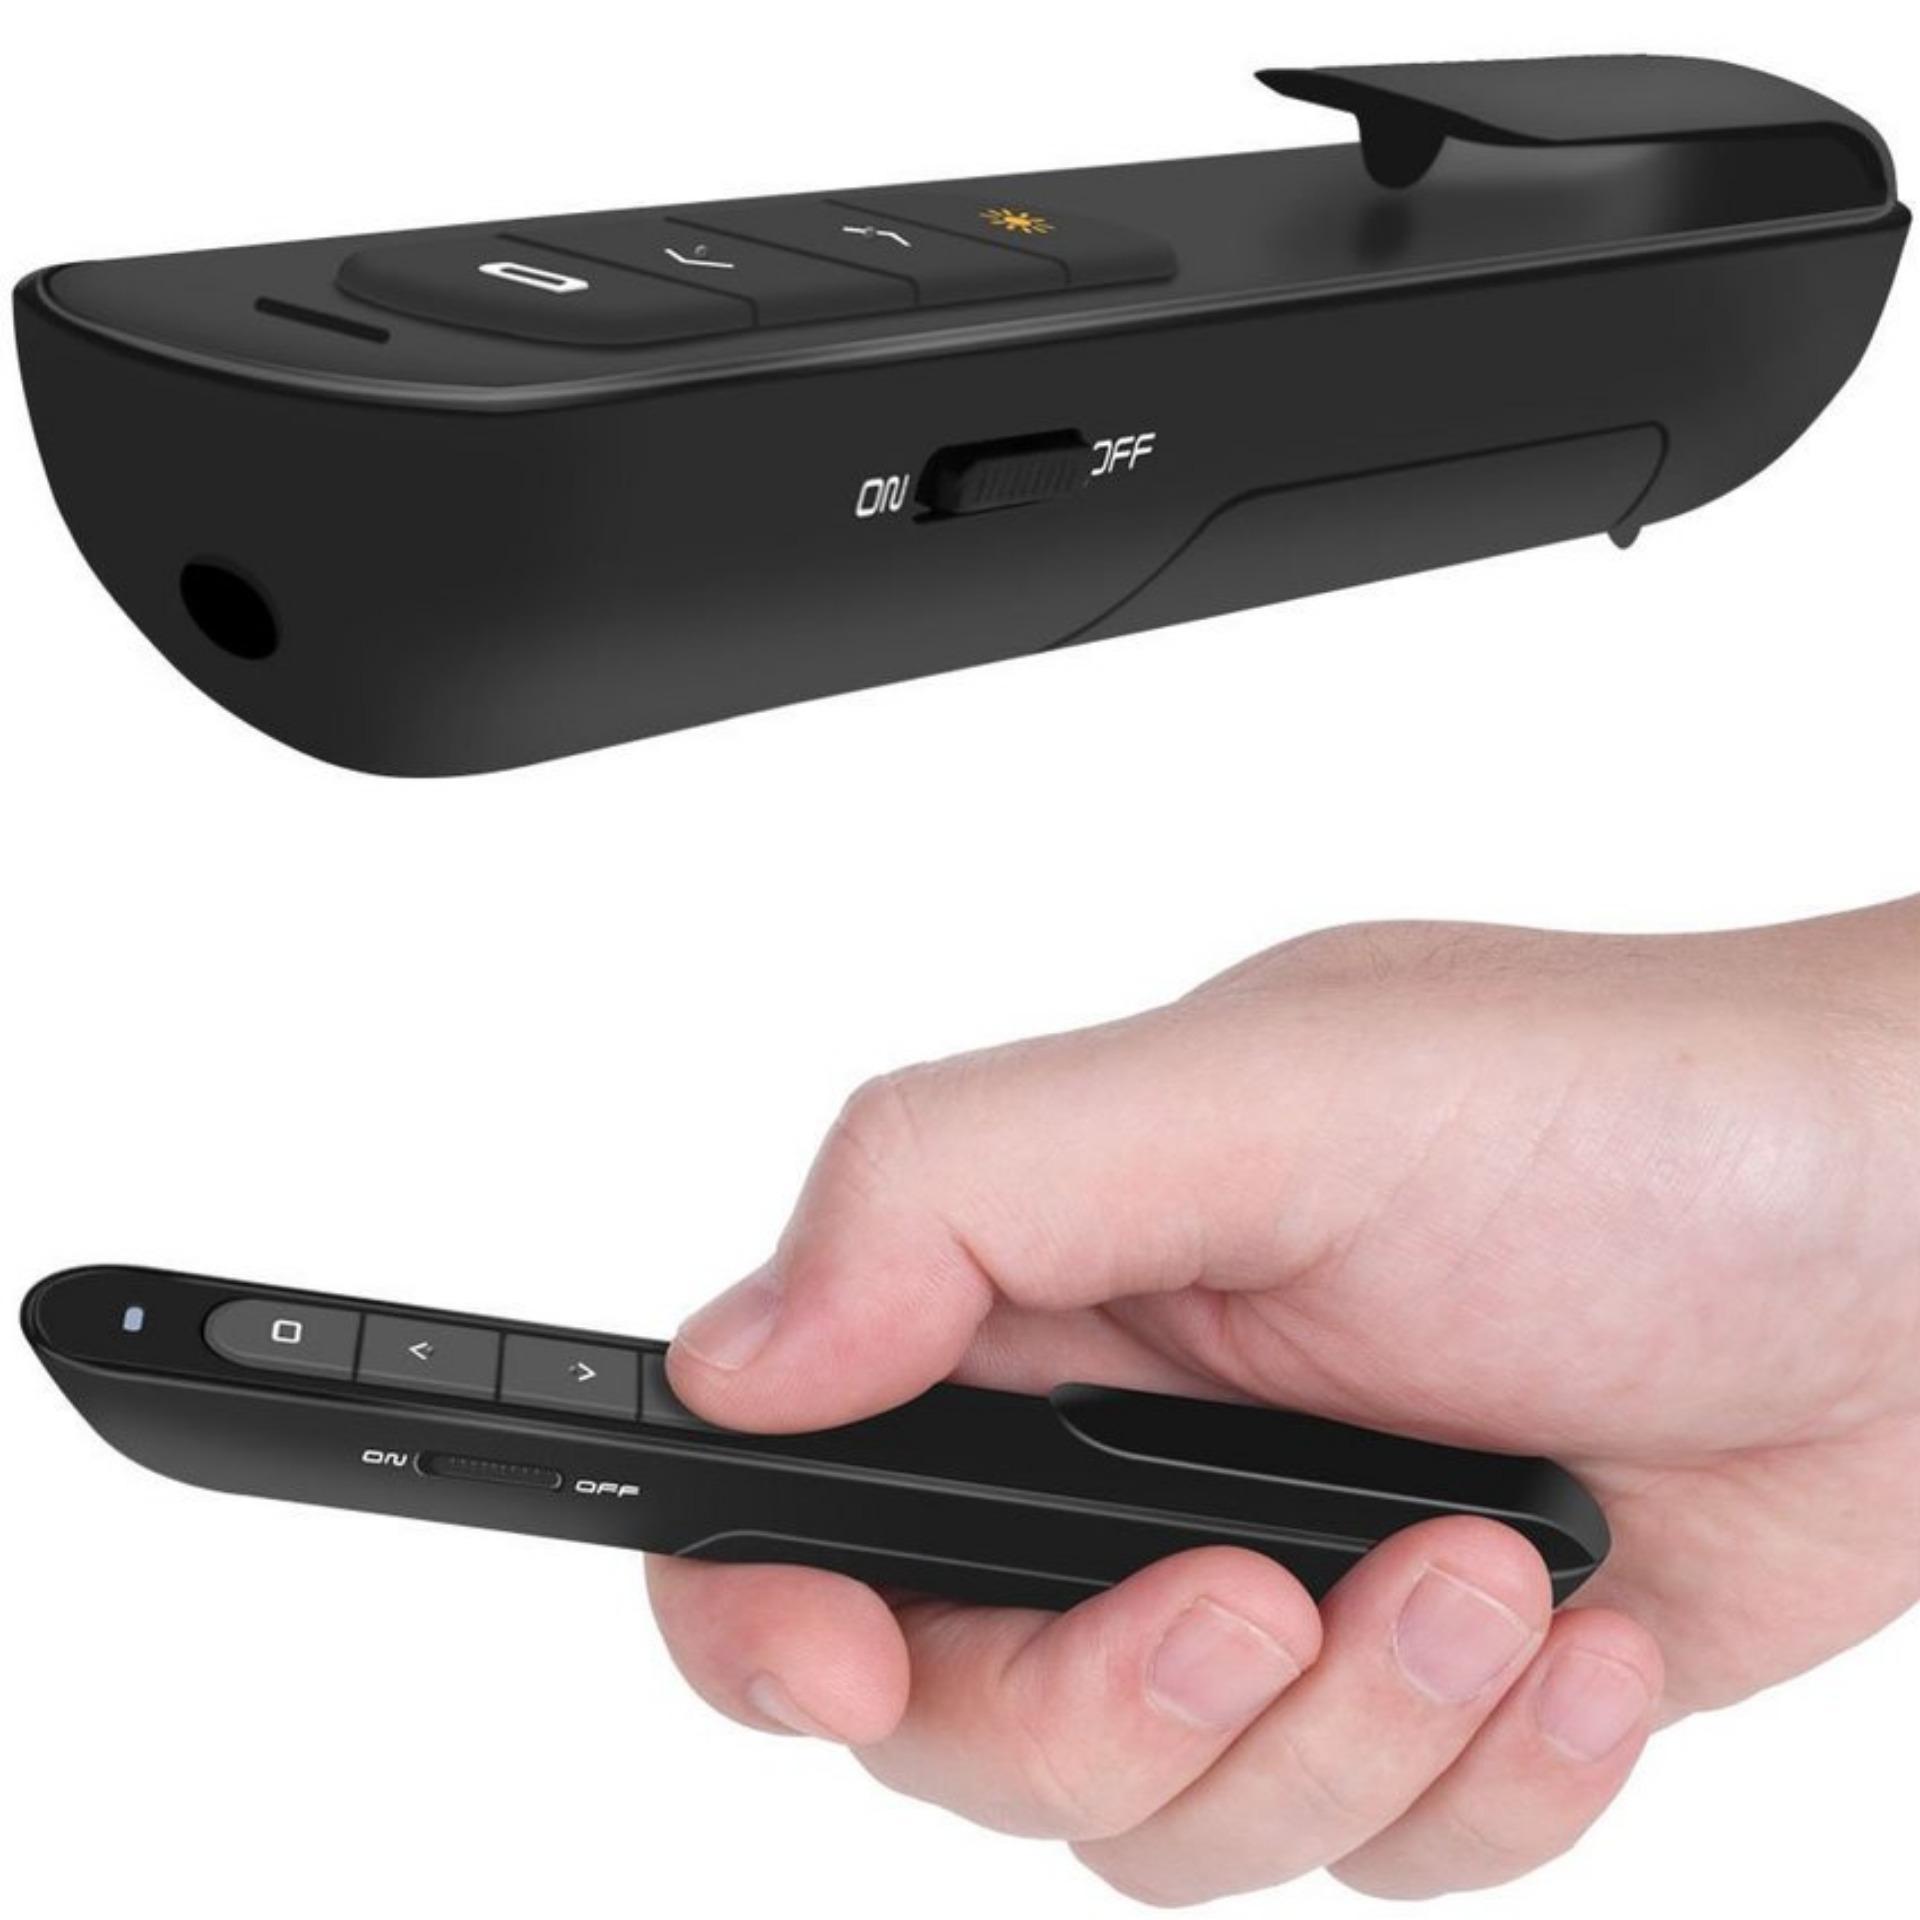 ... Wireless USB Presentation Remote Control Clicker Light Pointer PenLecture ...